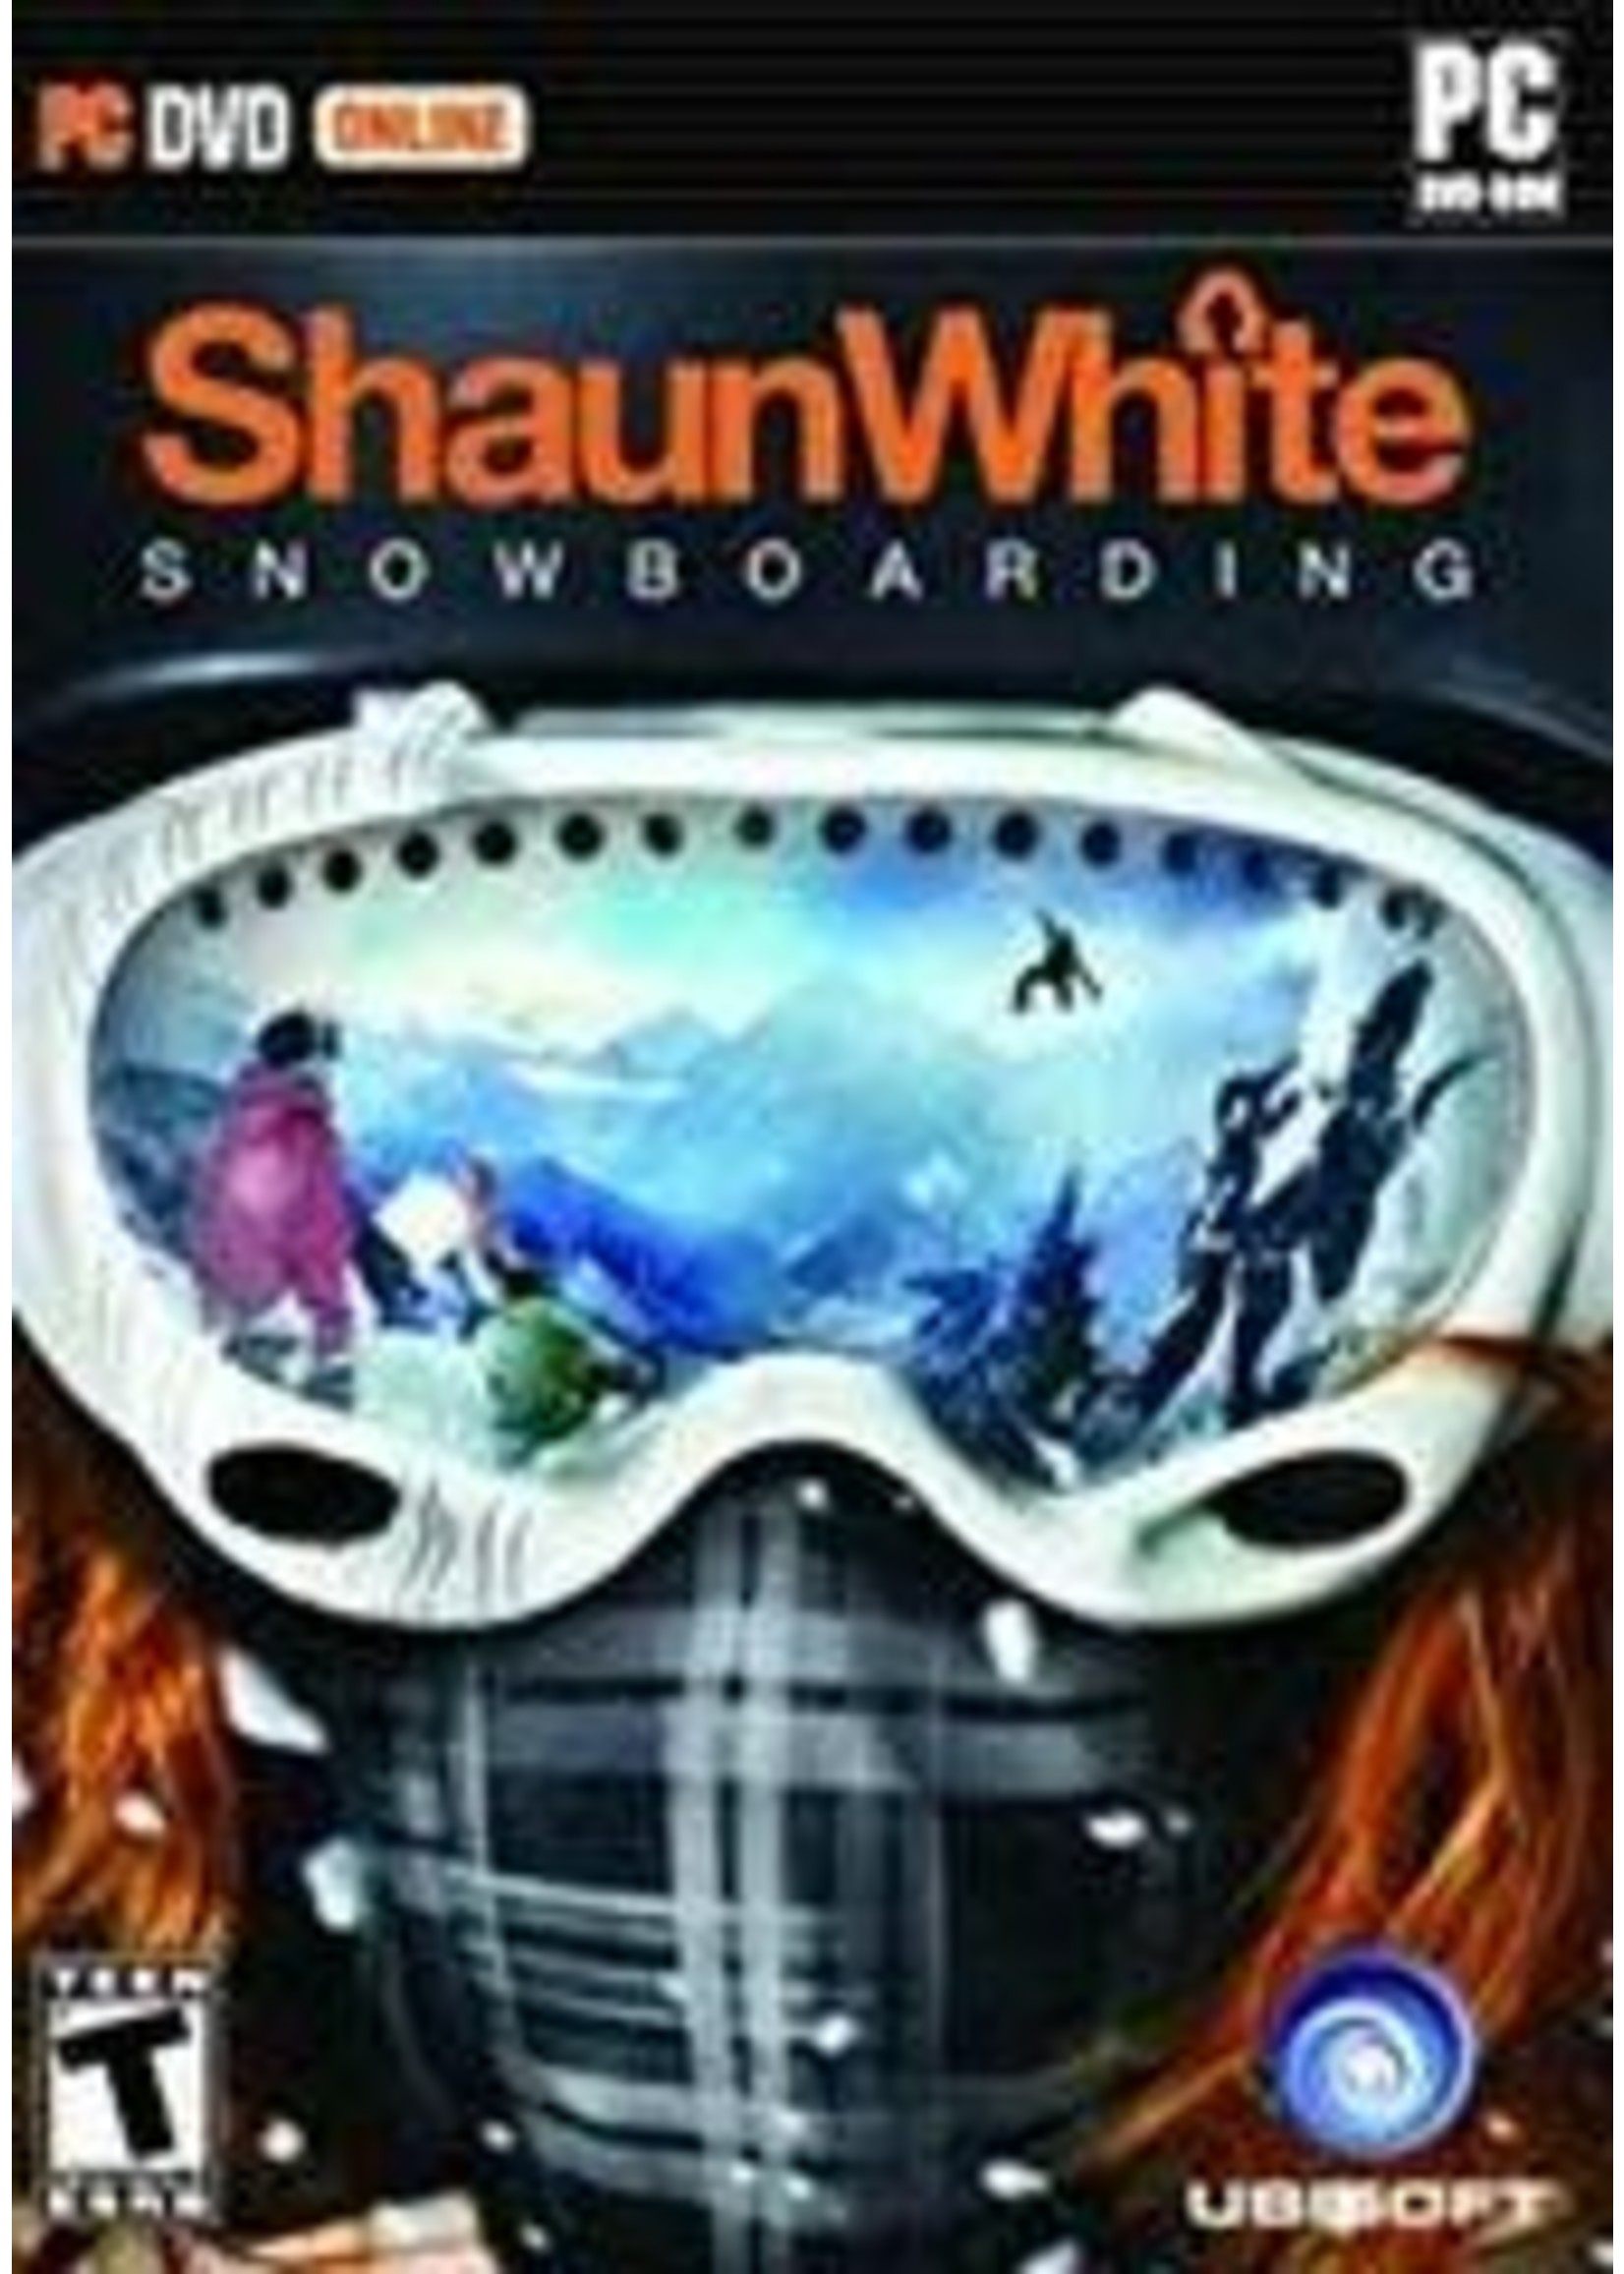 Shaun White Snowboarding PC Games